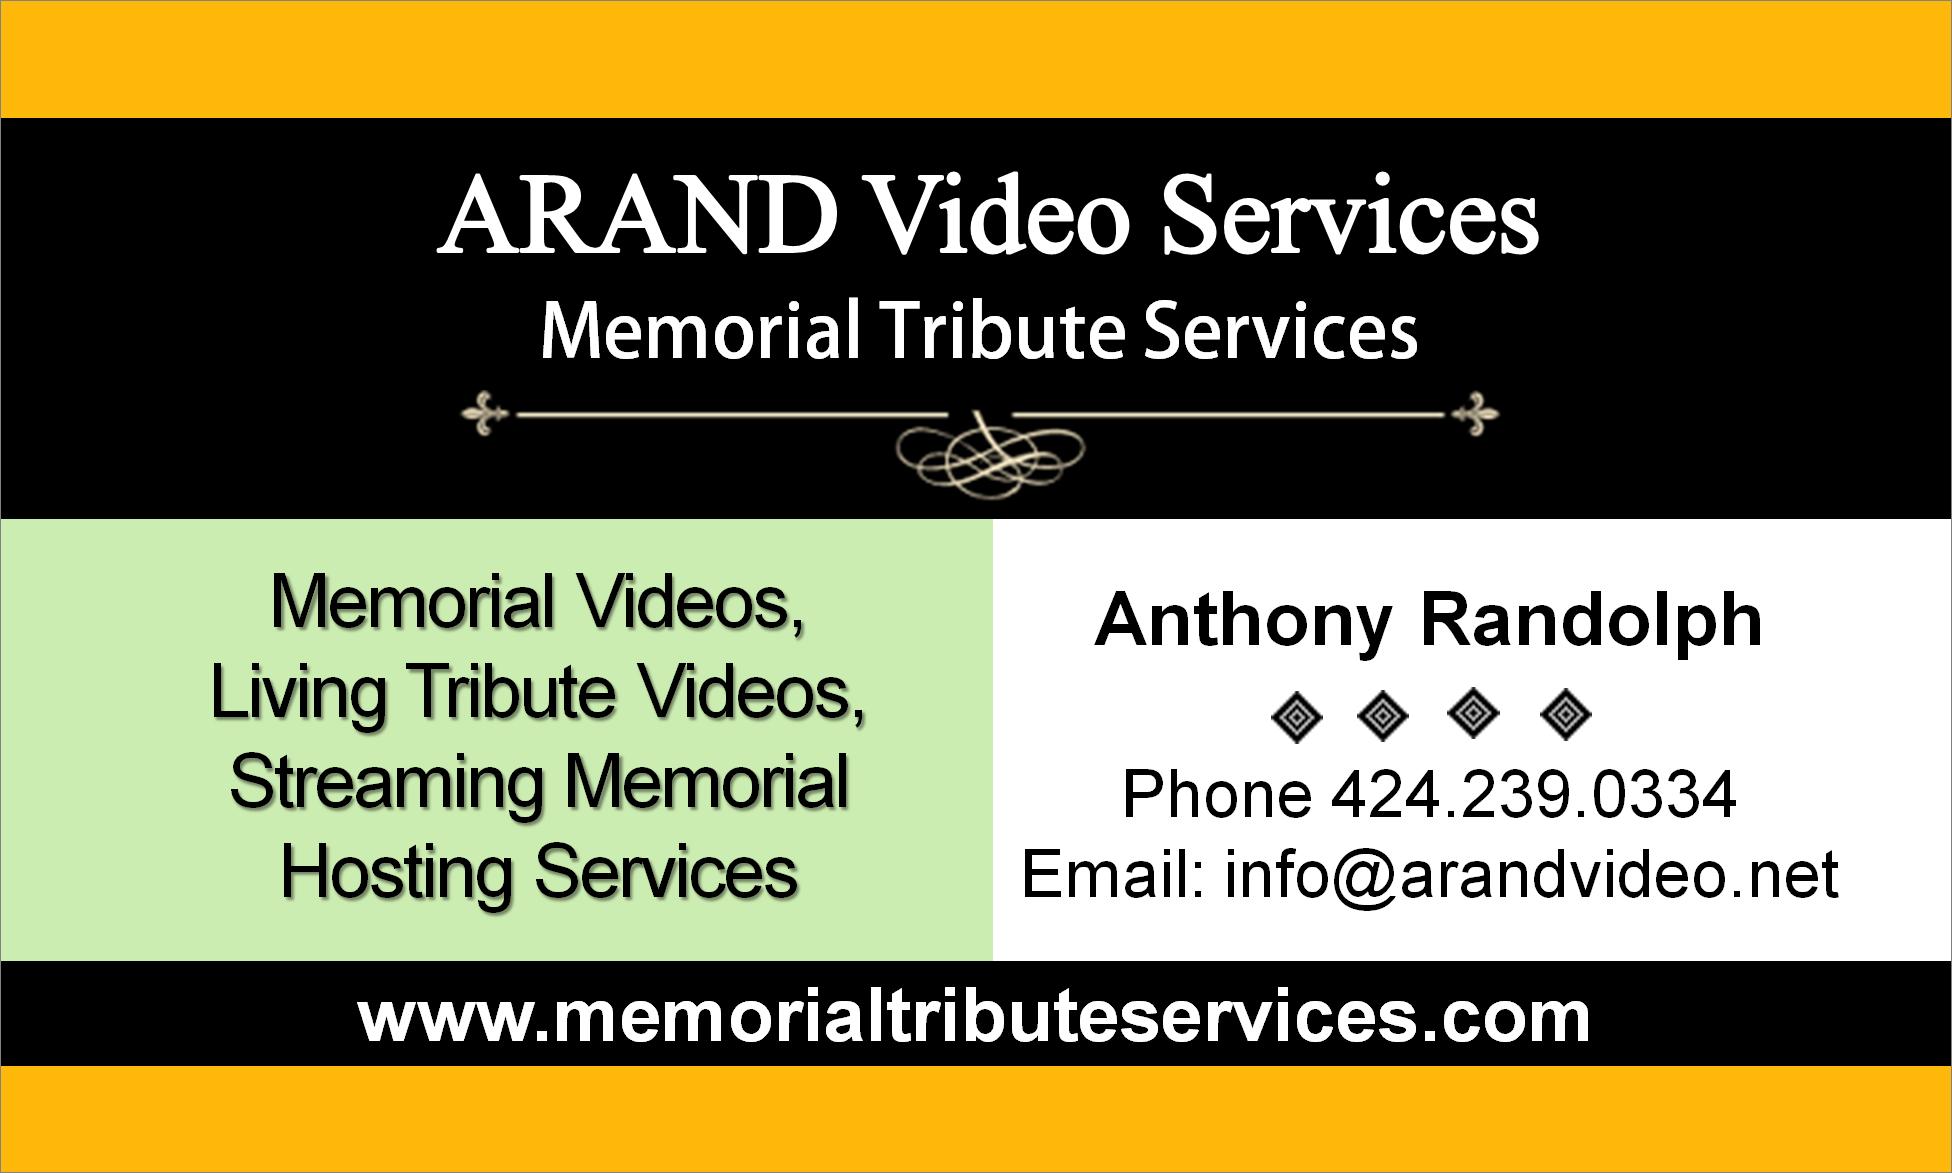 Memorial Video Services